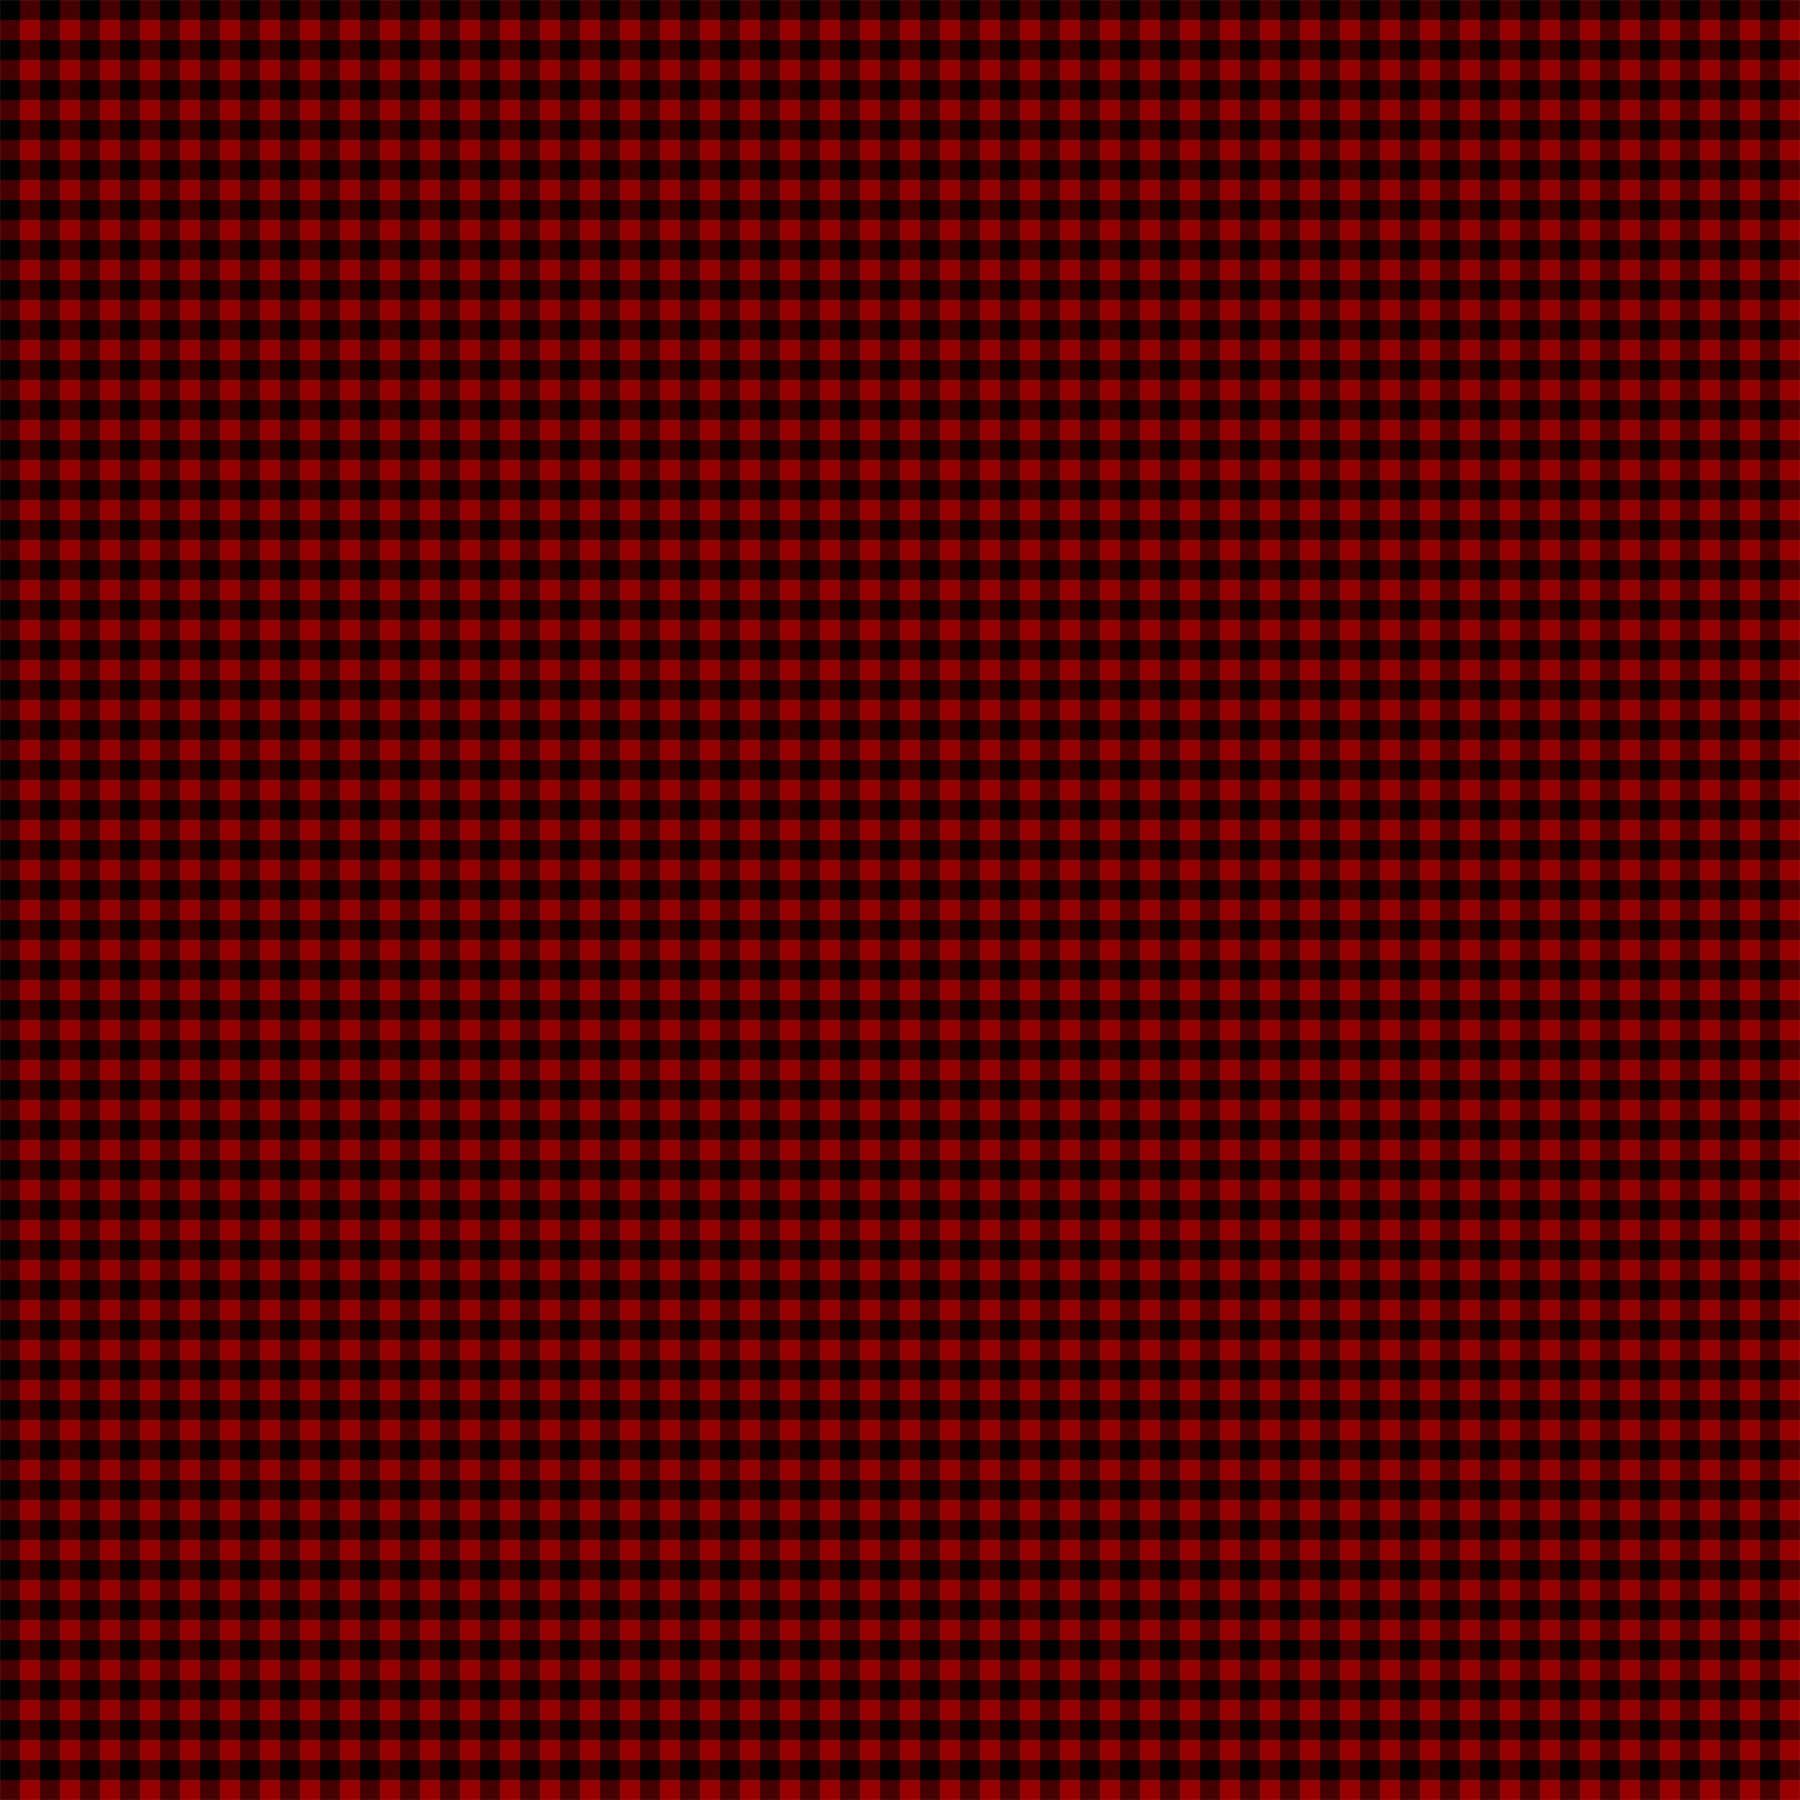 ALPINE WINTER RED BLACK 24340-24